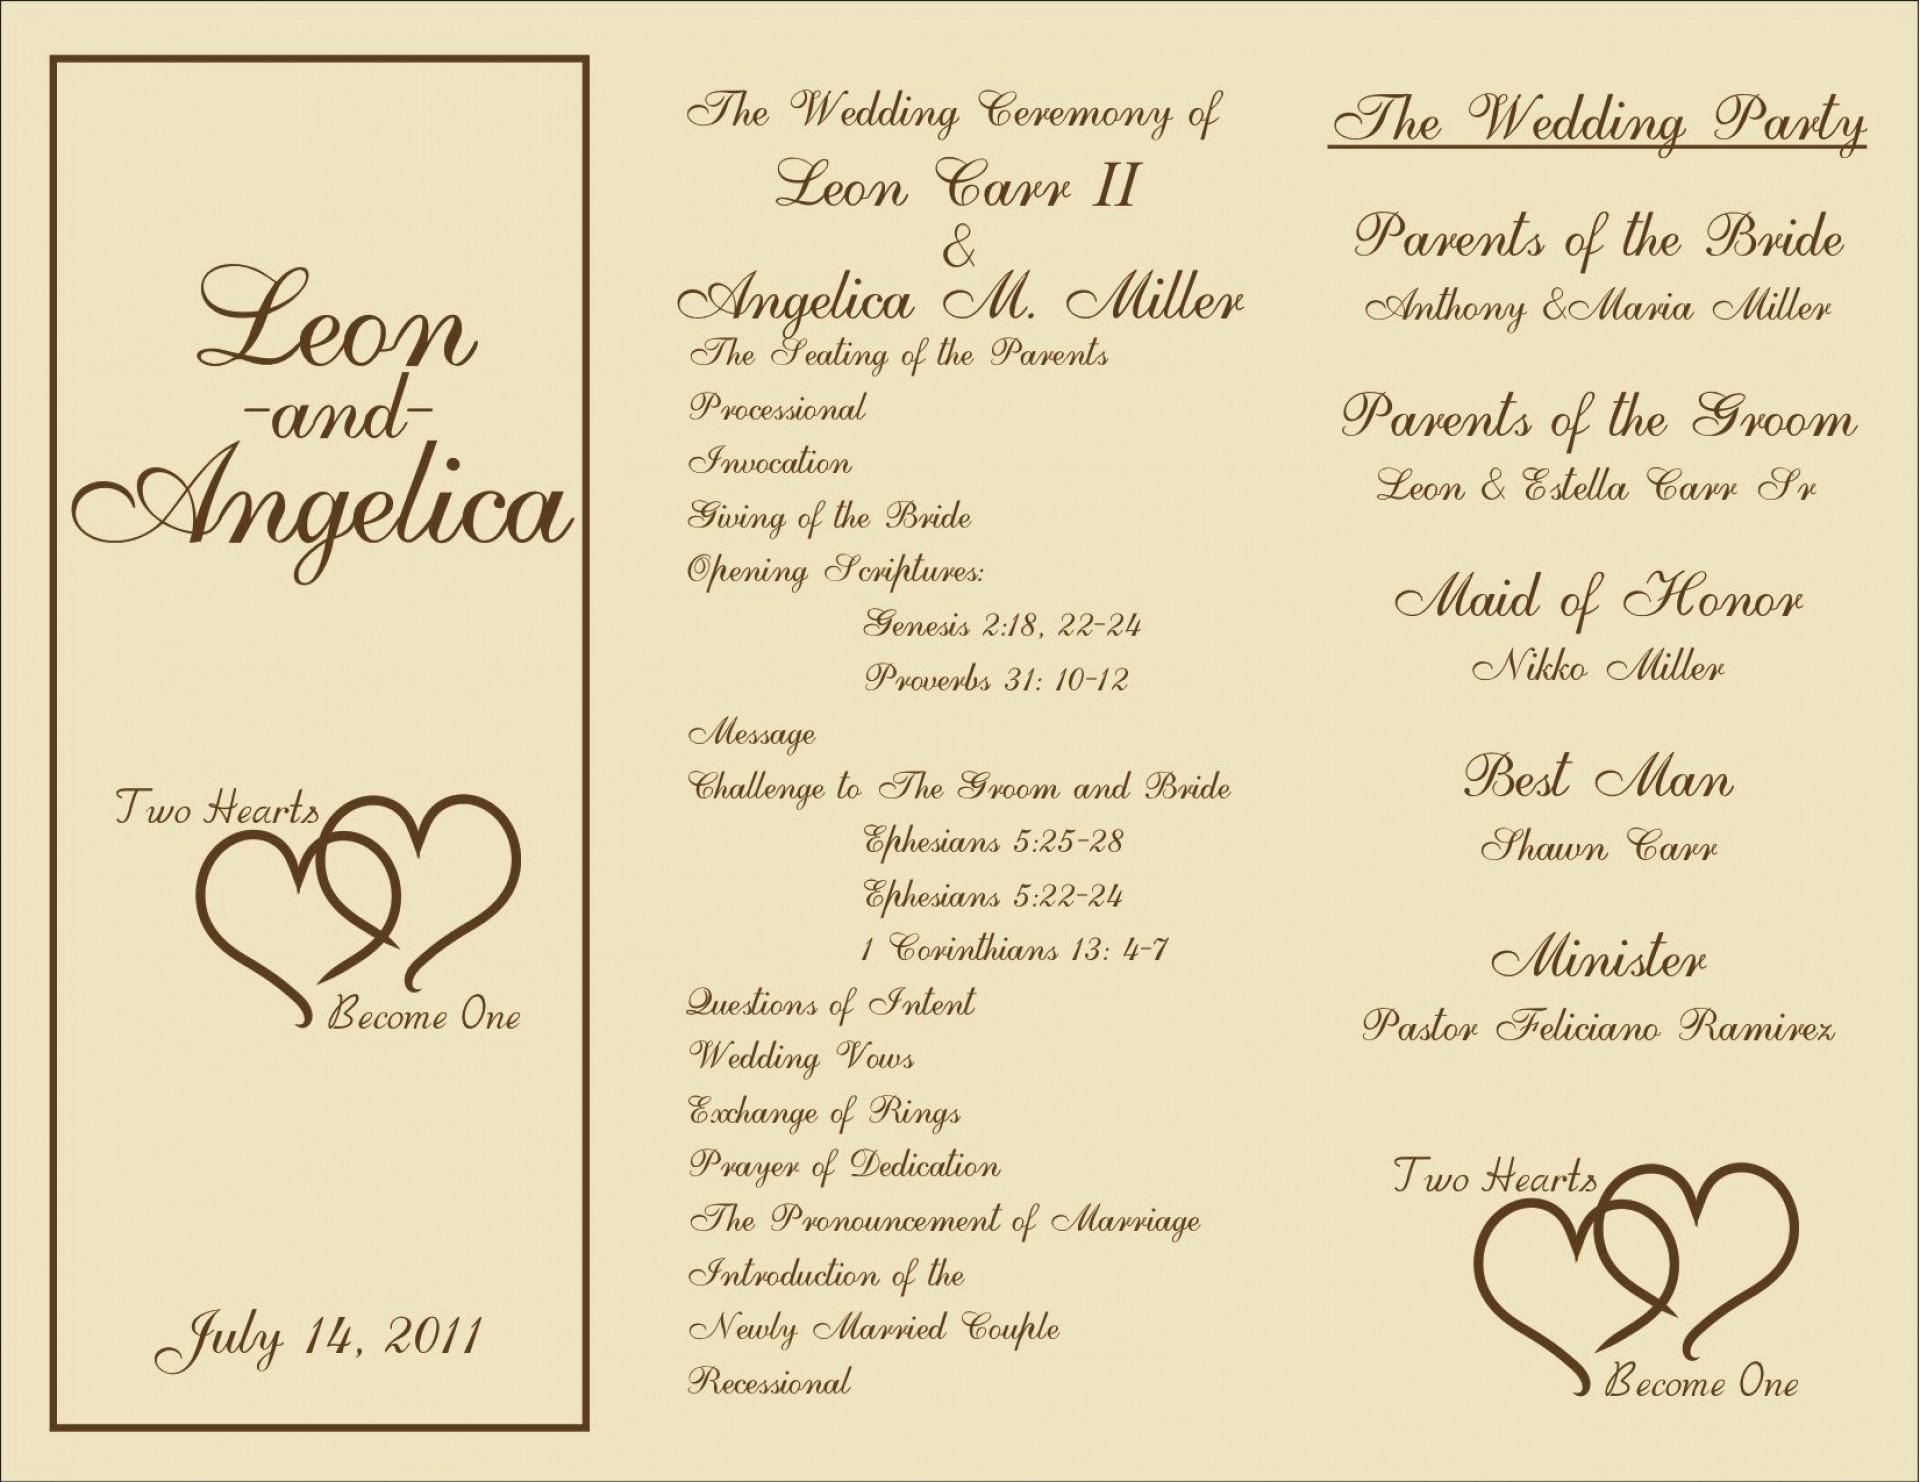 005 Beautiful Template For Wedding Program Idea  Word Free Catholic1920